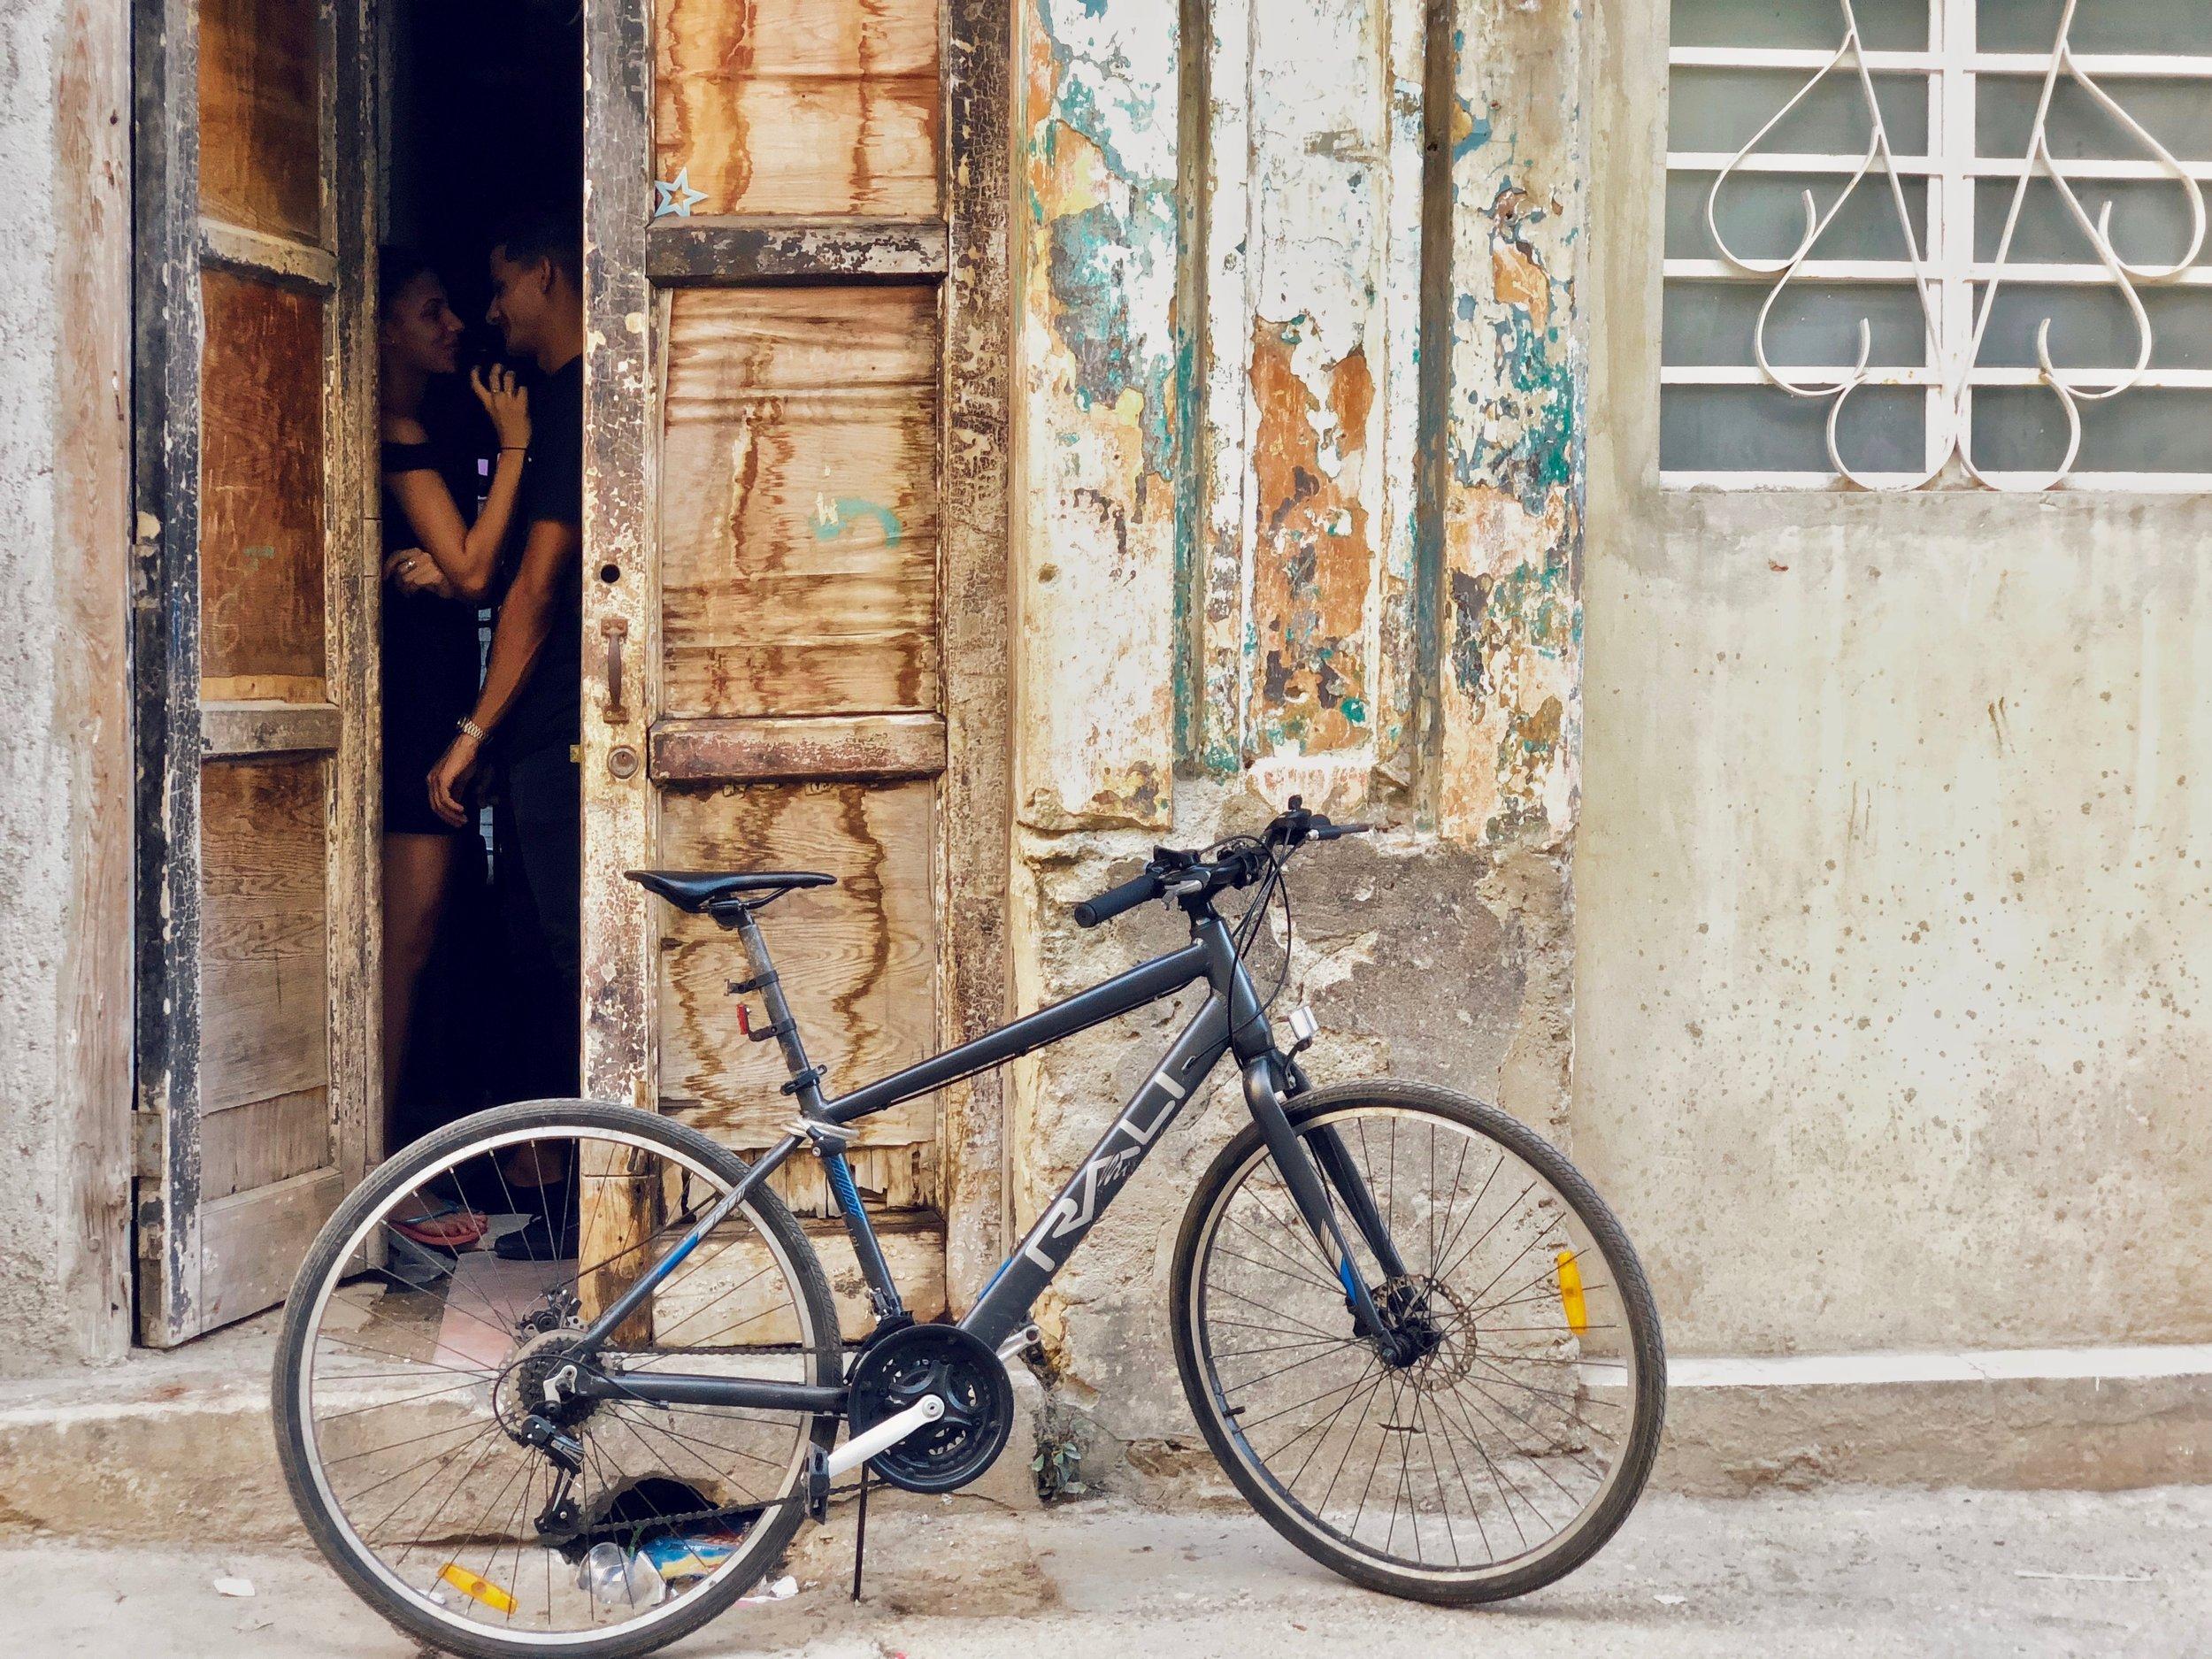 Alley Romance by Seshukumar Sareday